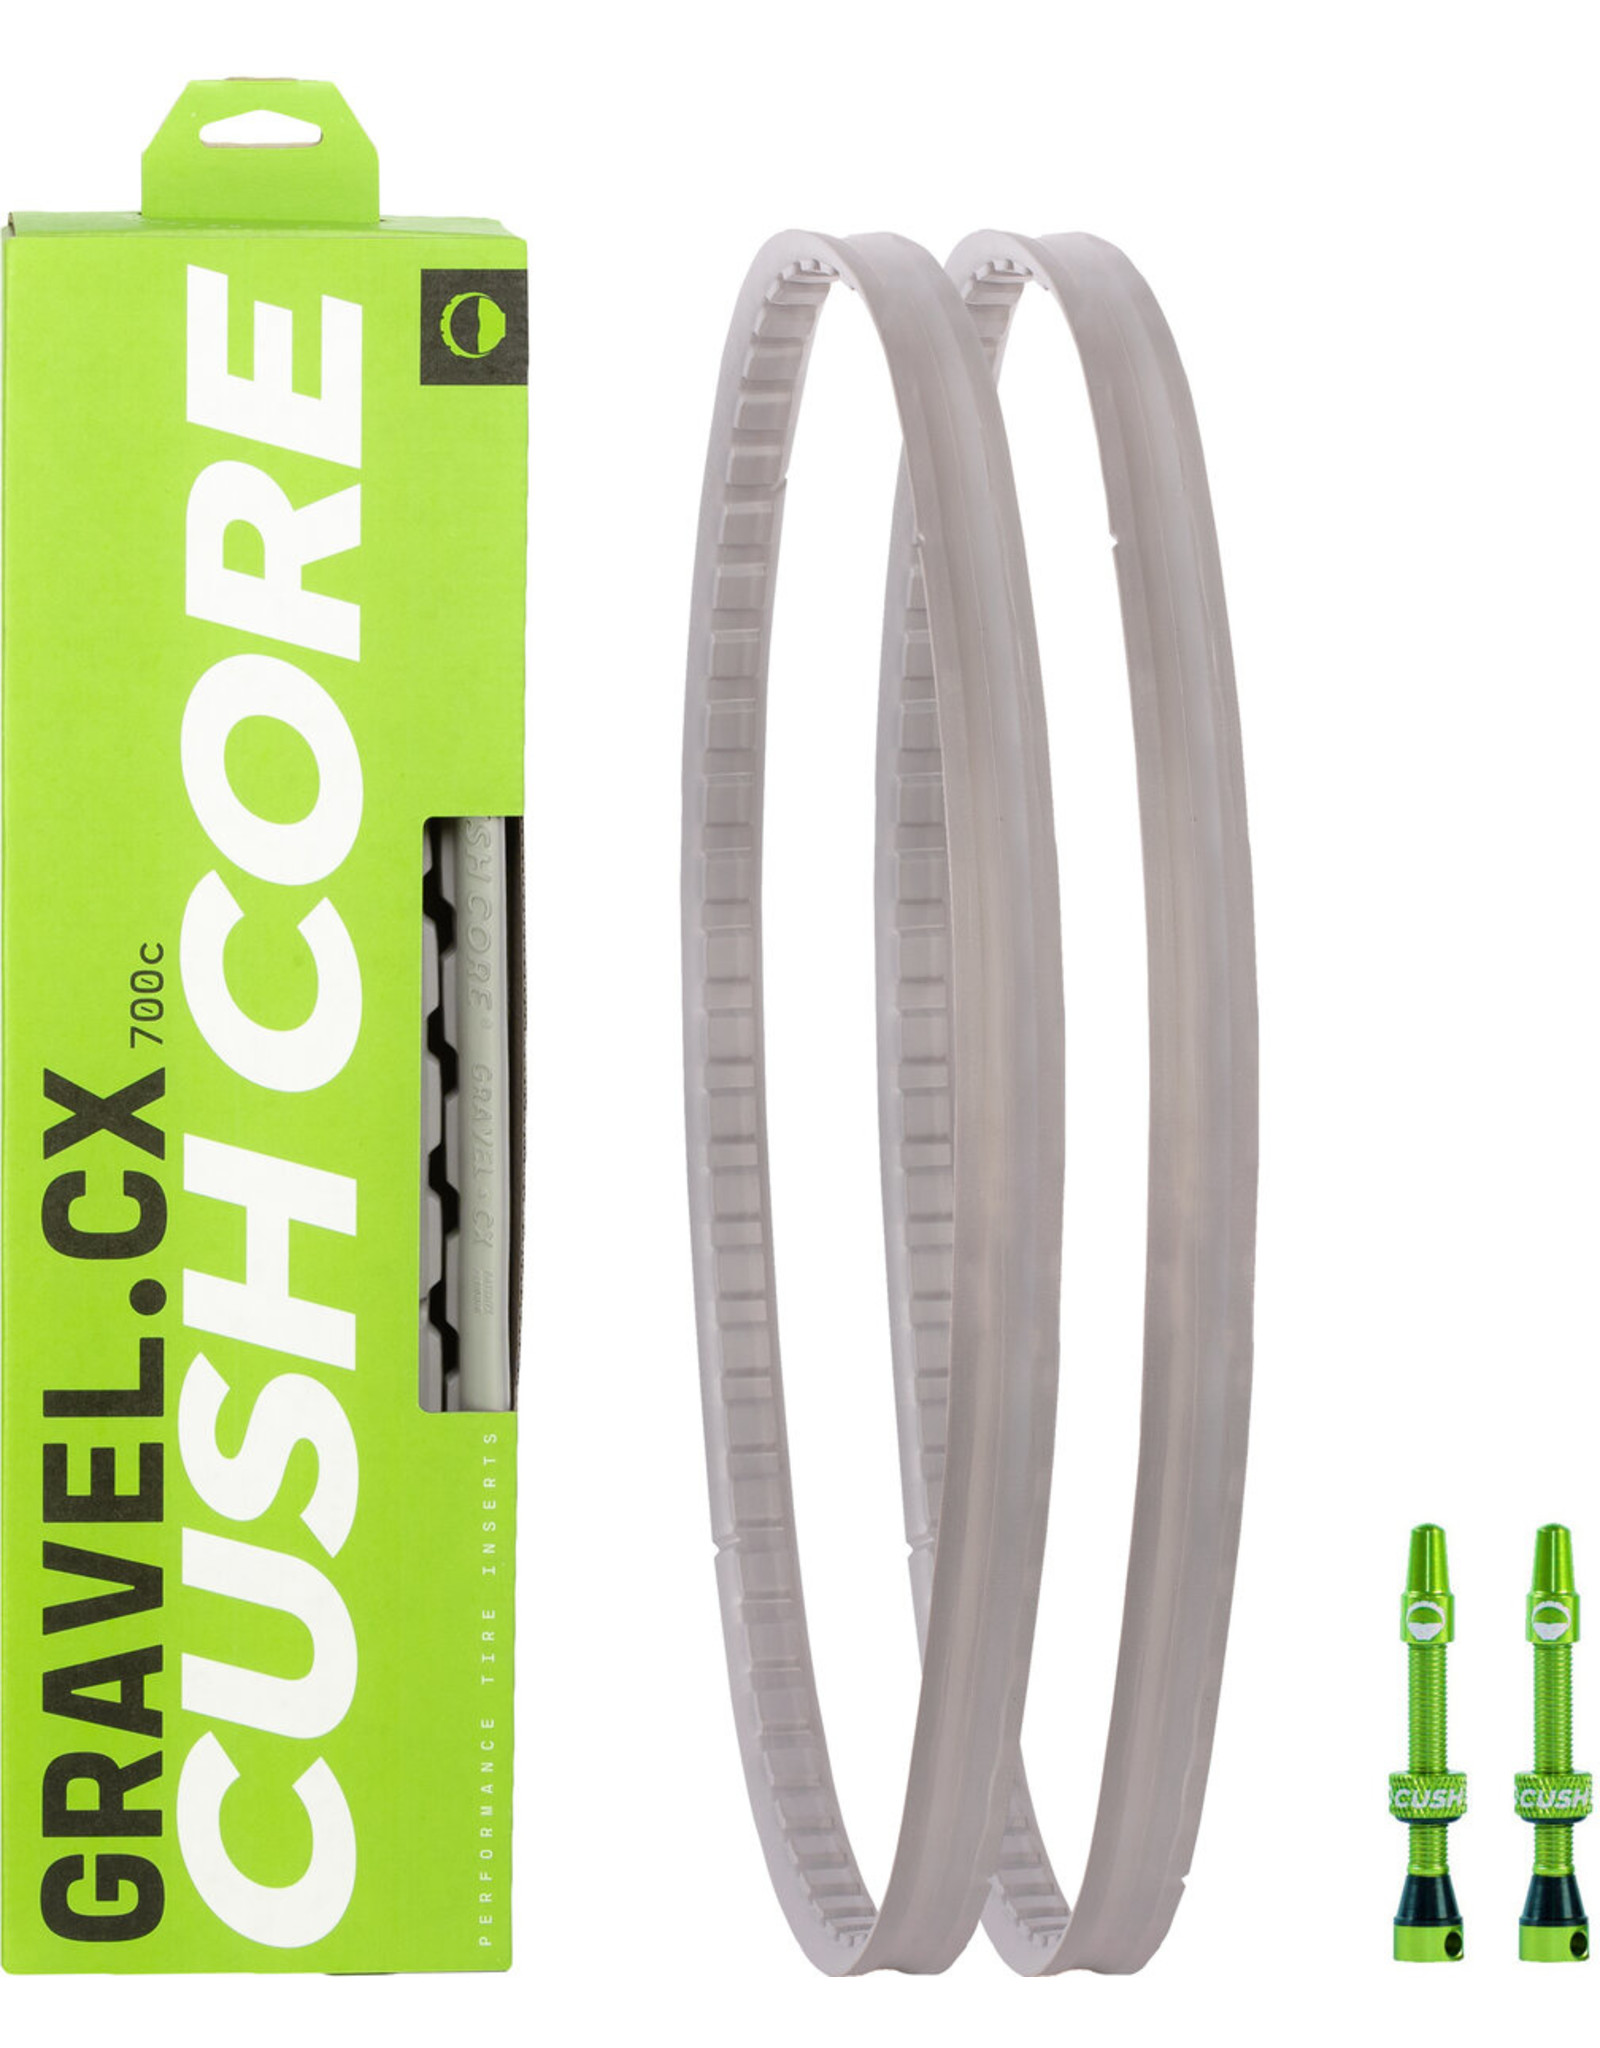 Cushcore Cushcore Tubeless Tire Insert Set 700c/Gravel/CX